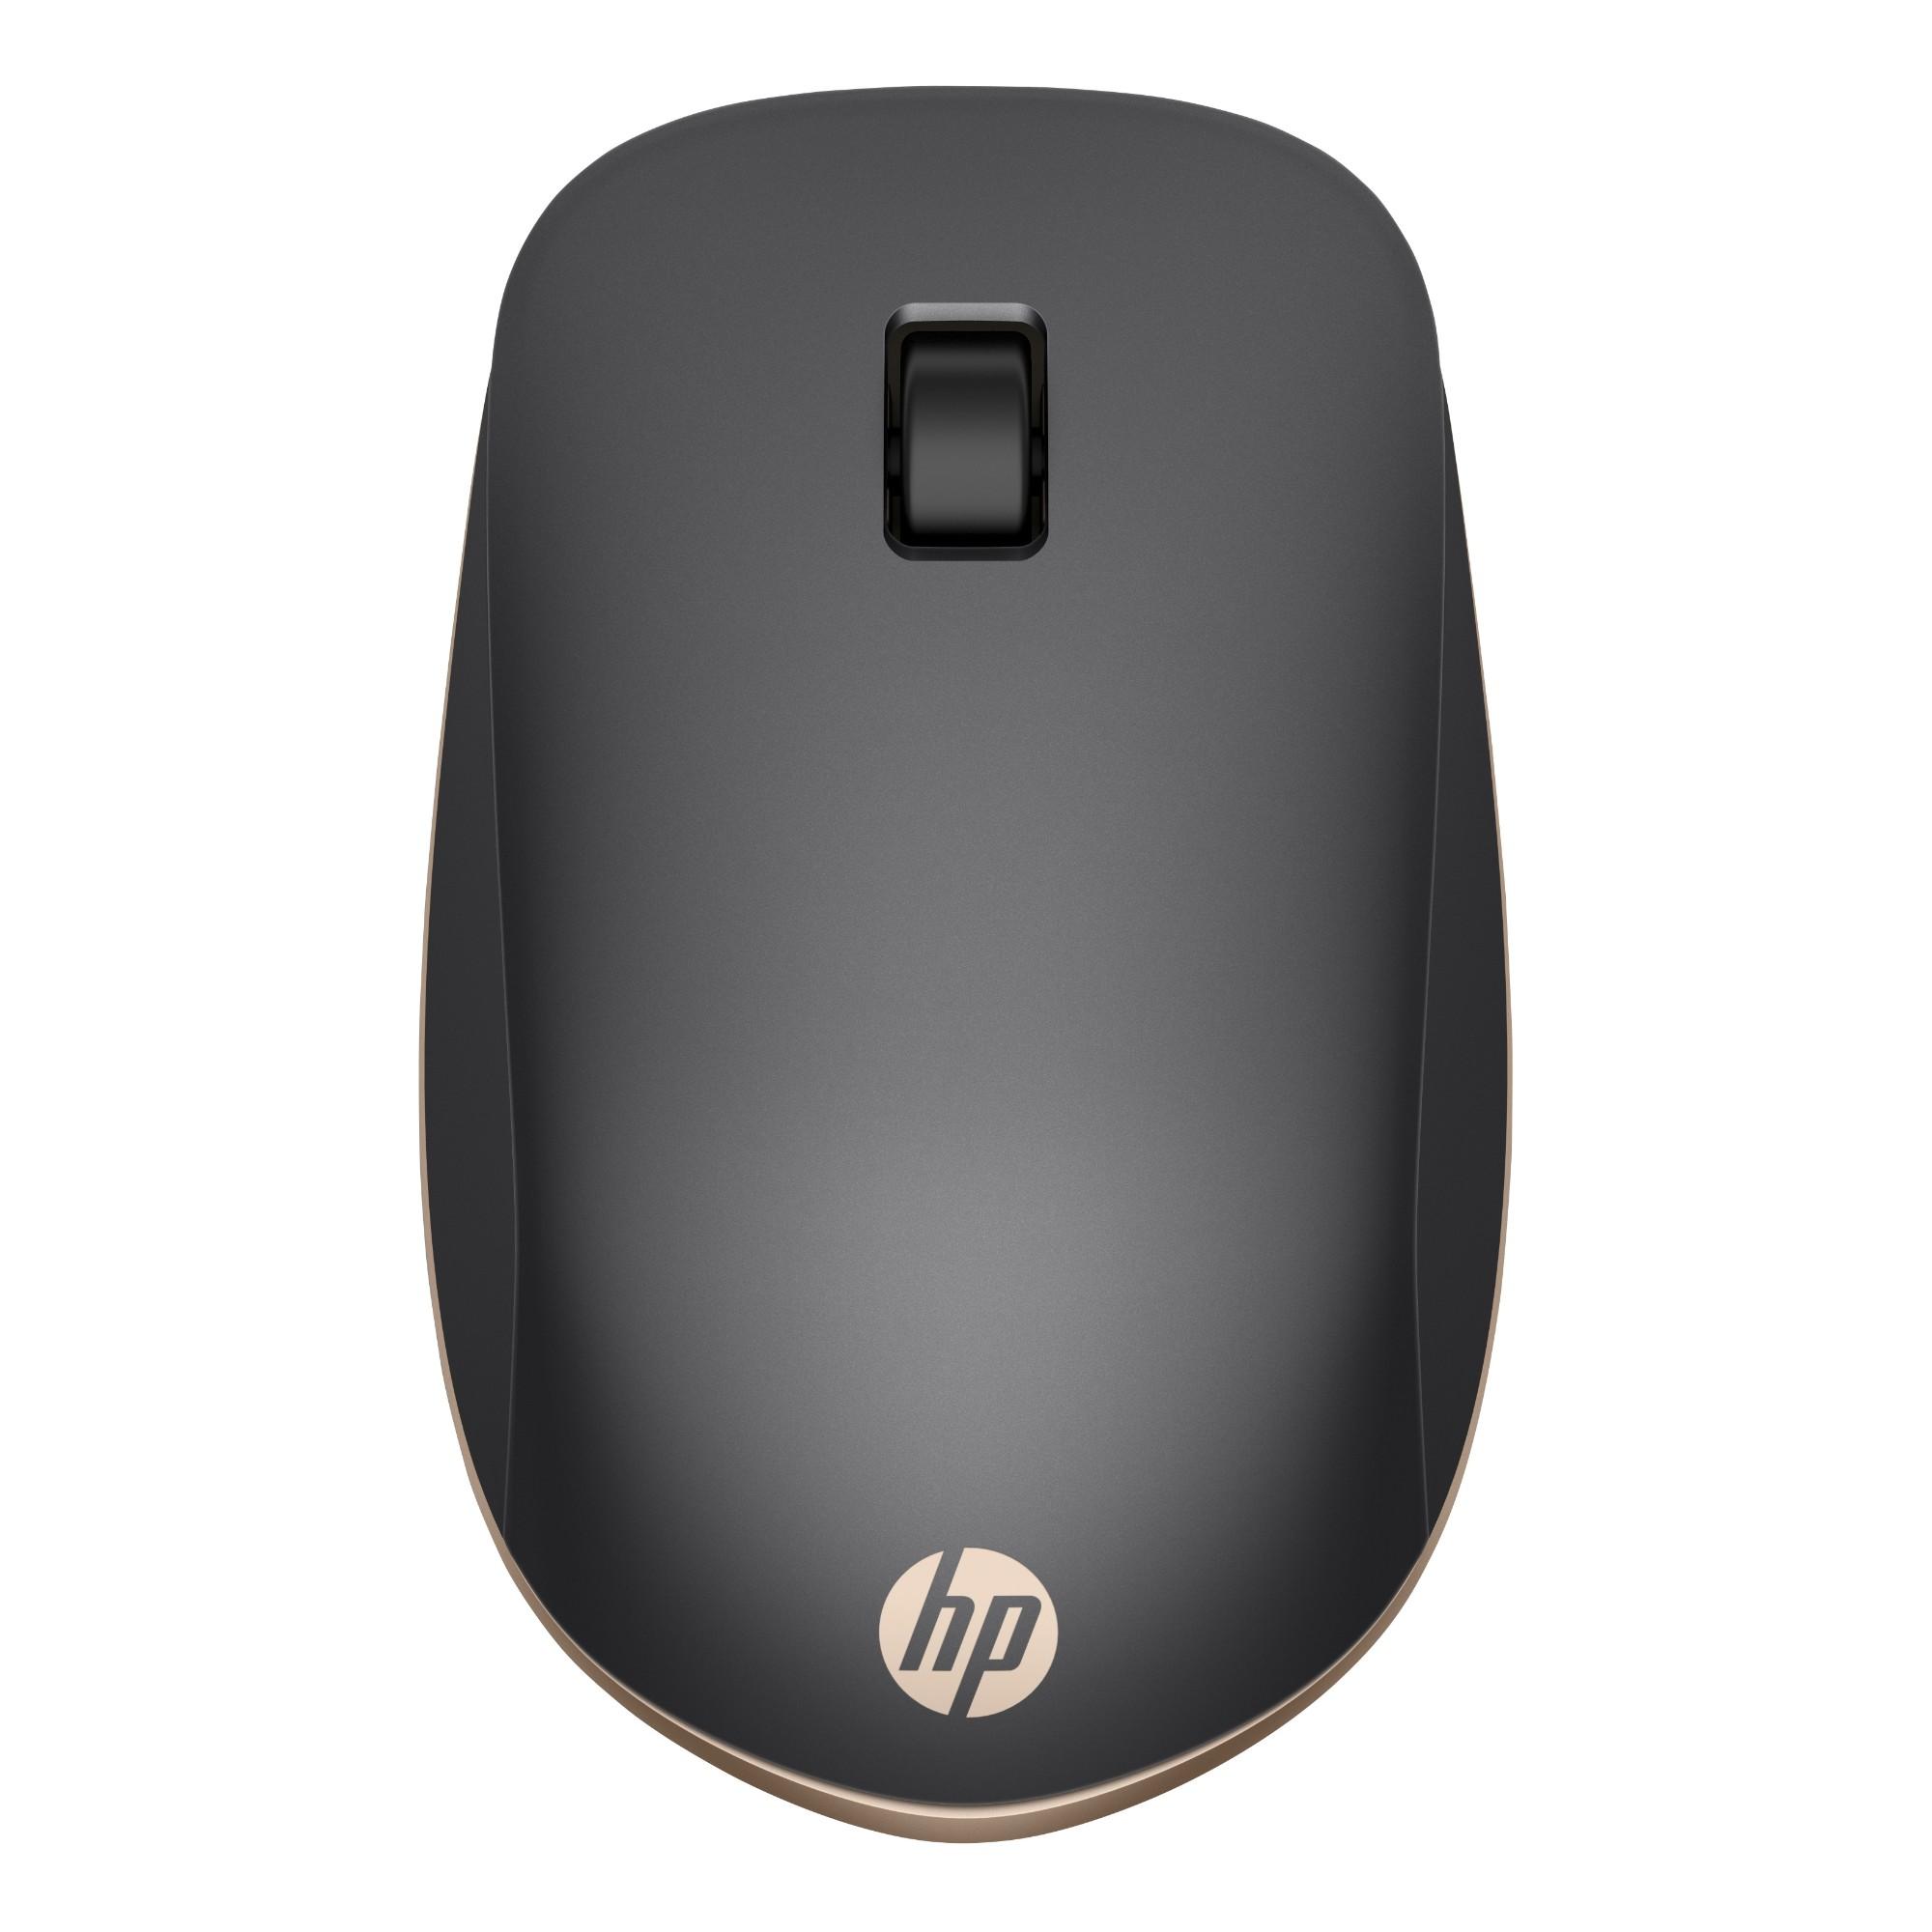 HP Z5000 mouse Ambidextrous Bluetooth Optical 1200 DPI